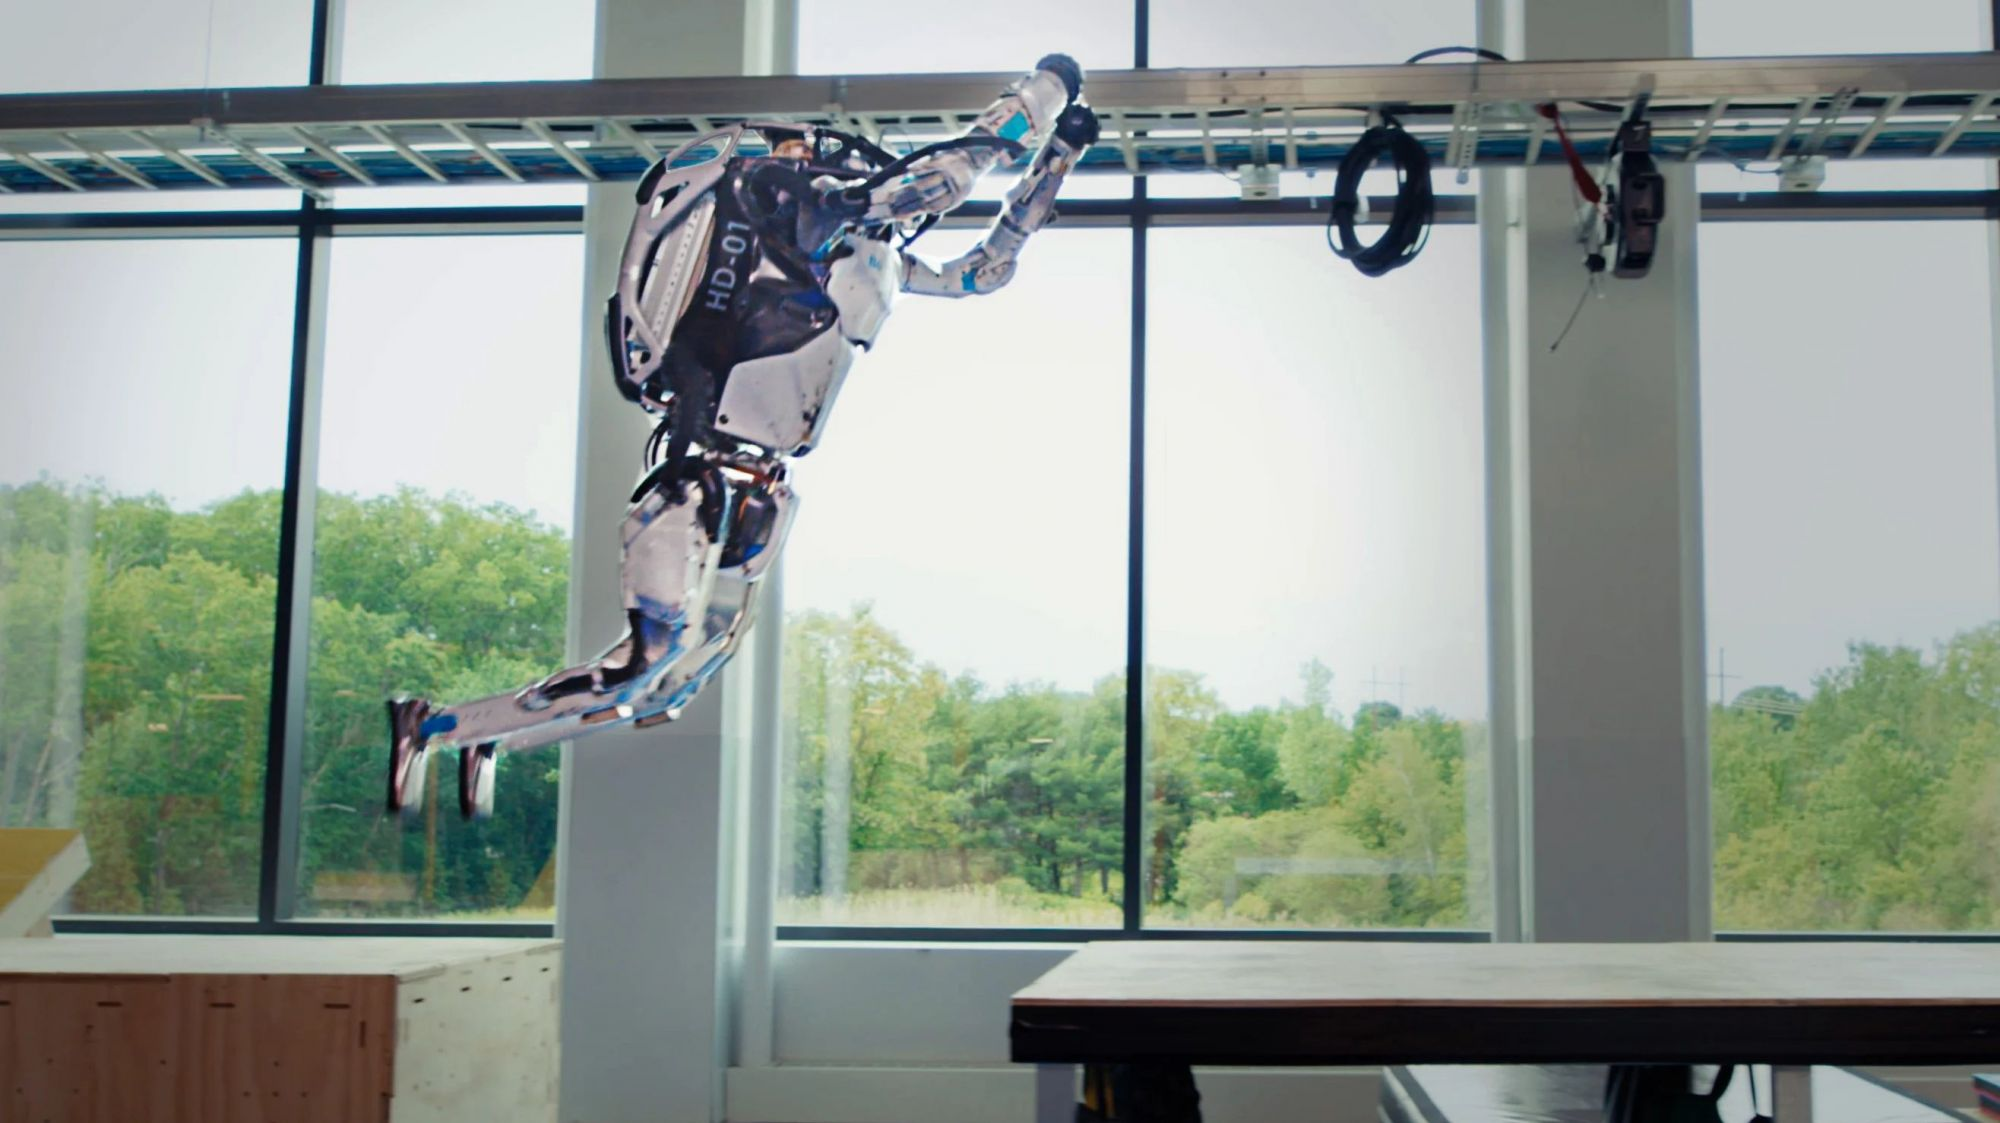 Робот показал успехи впаркуре